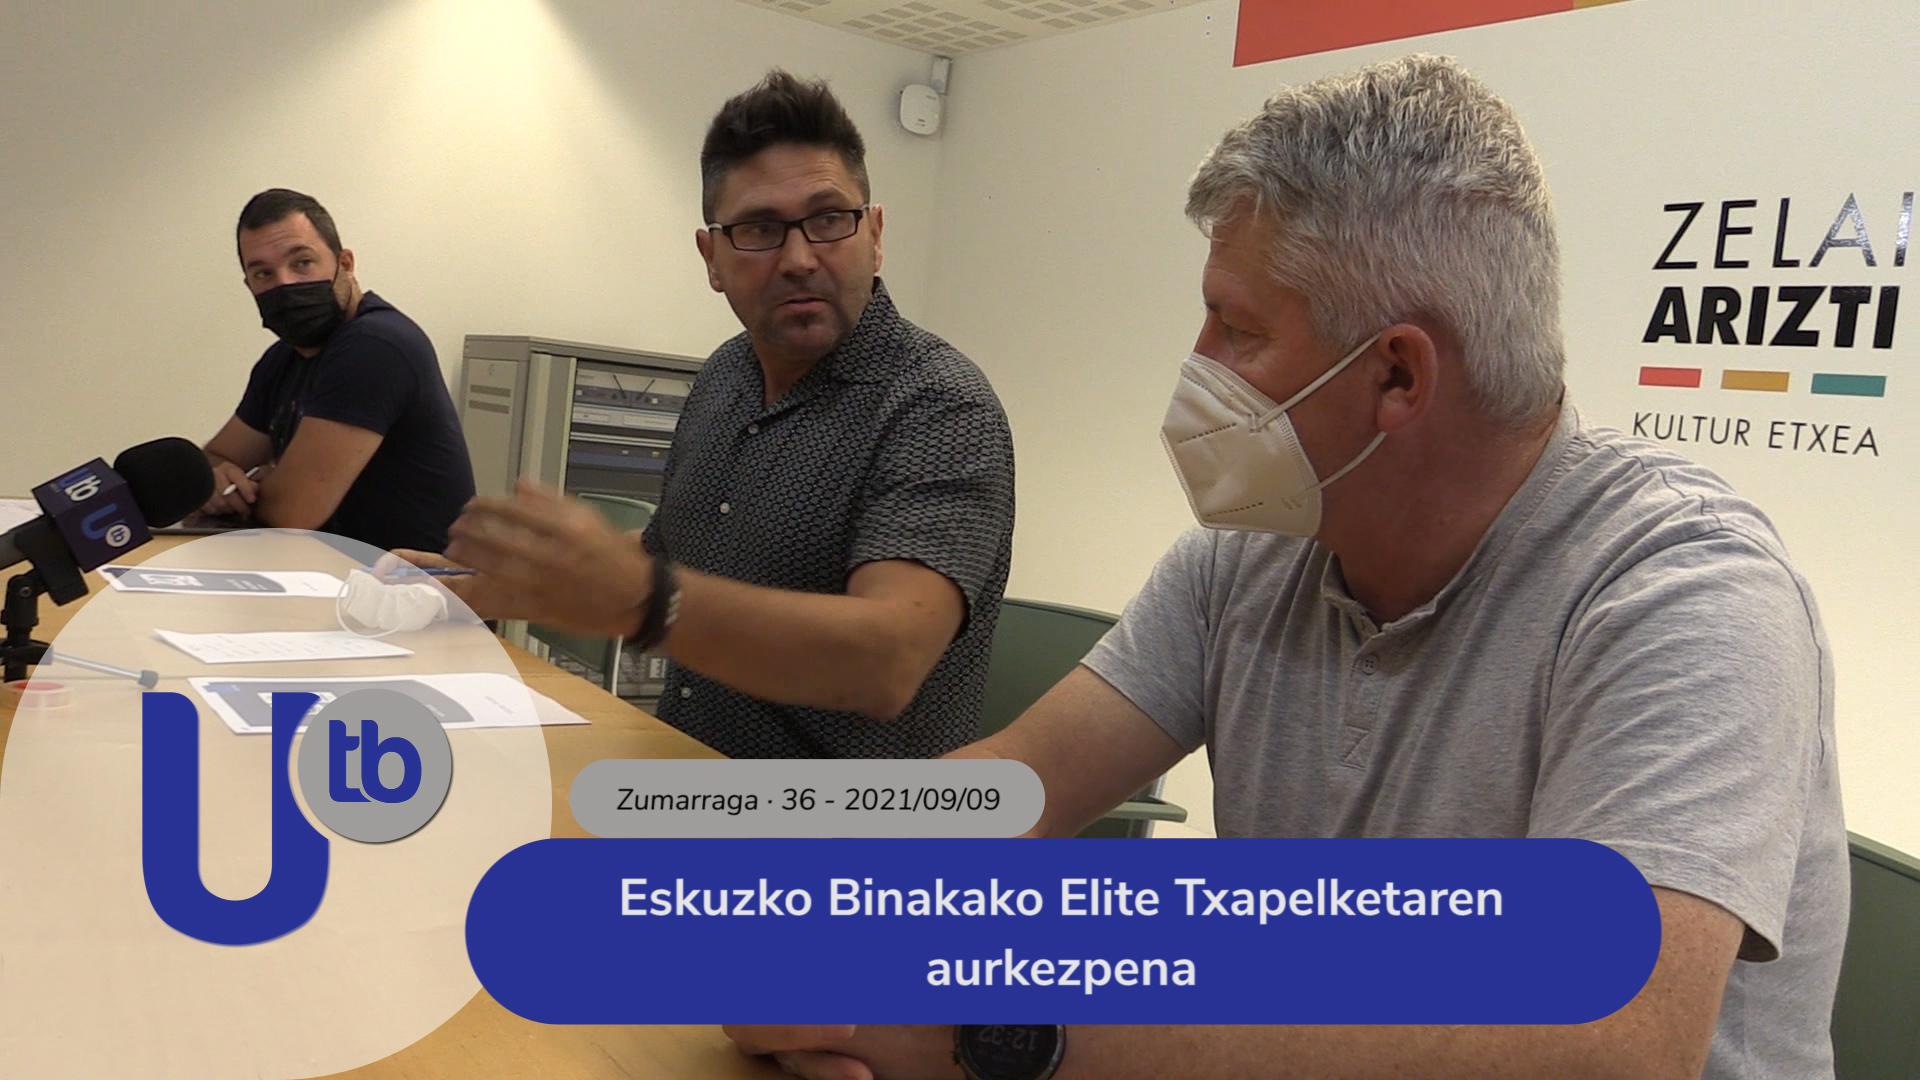 Eskuzko Binakako Elite Txapelketaren aurkezpena / Presentación del Campeonato Élite de pelota a mano por parejas